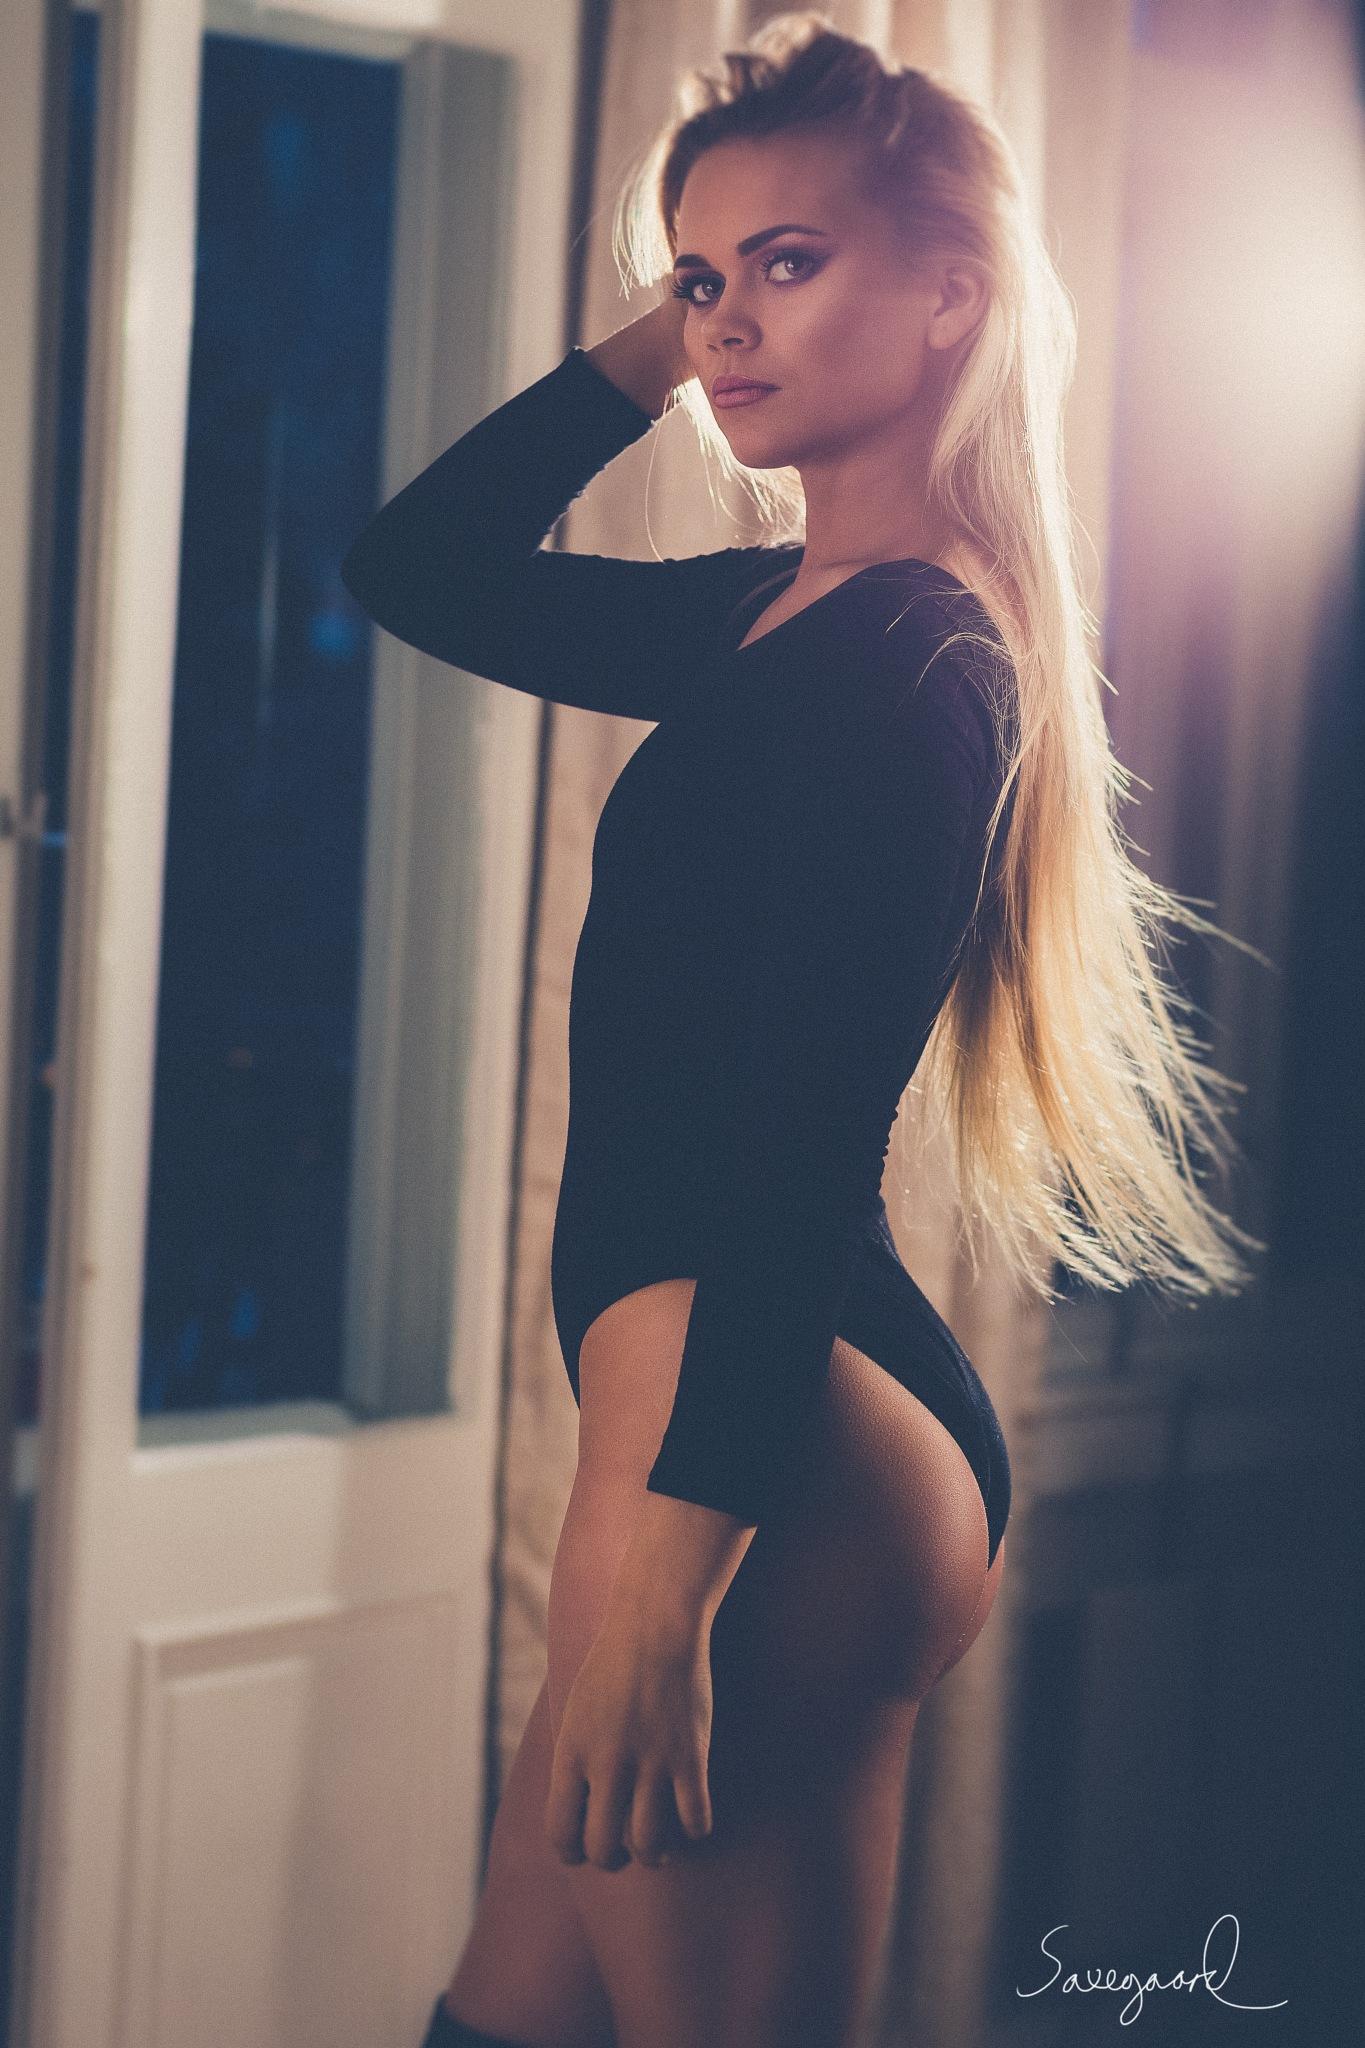 Saxegaard Model: Rebekka Norvik by Saxegaard Photography